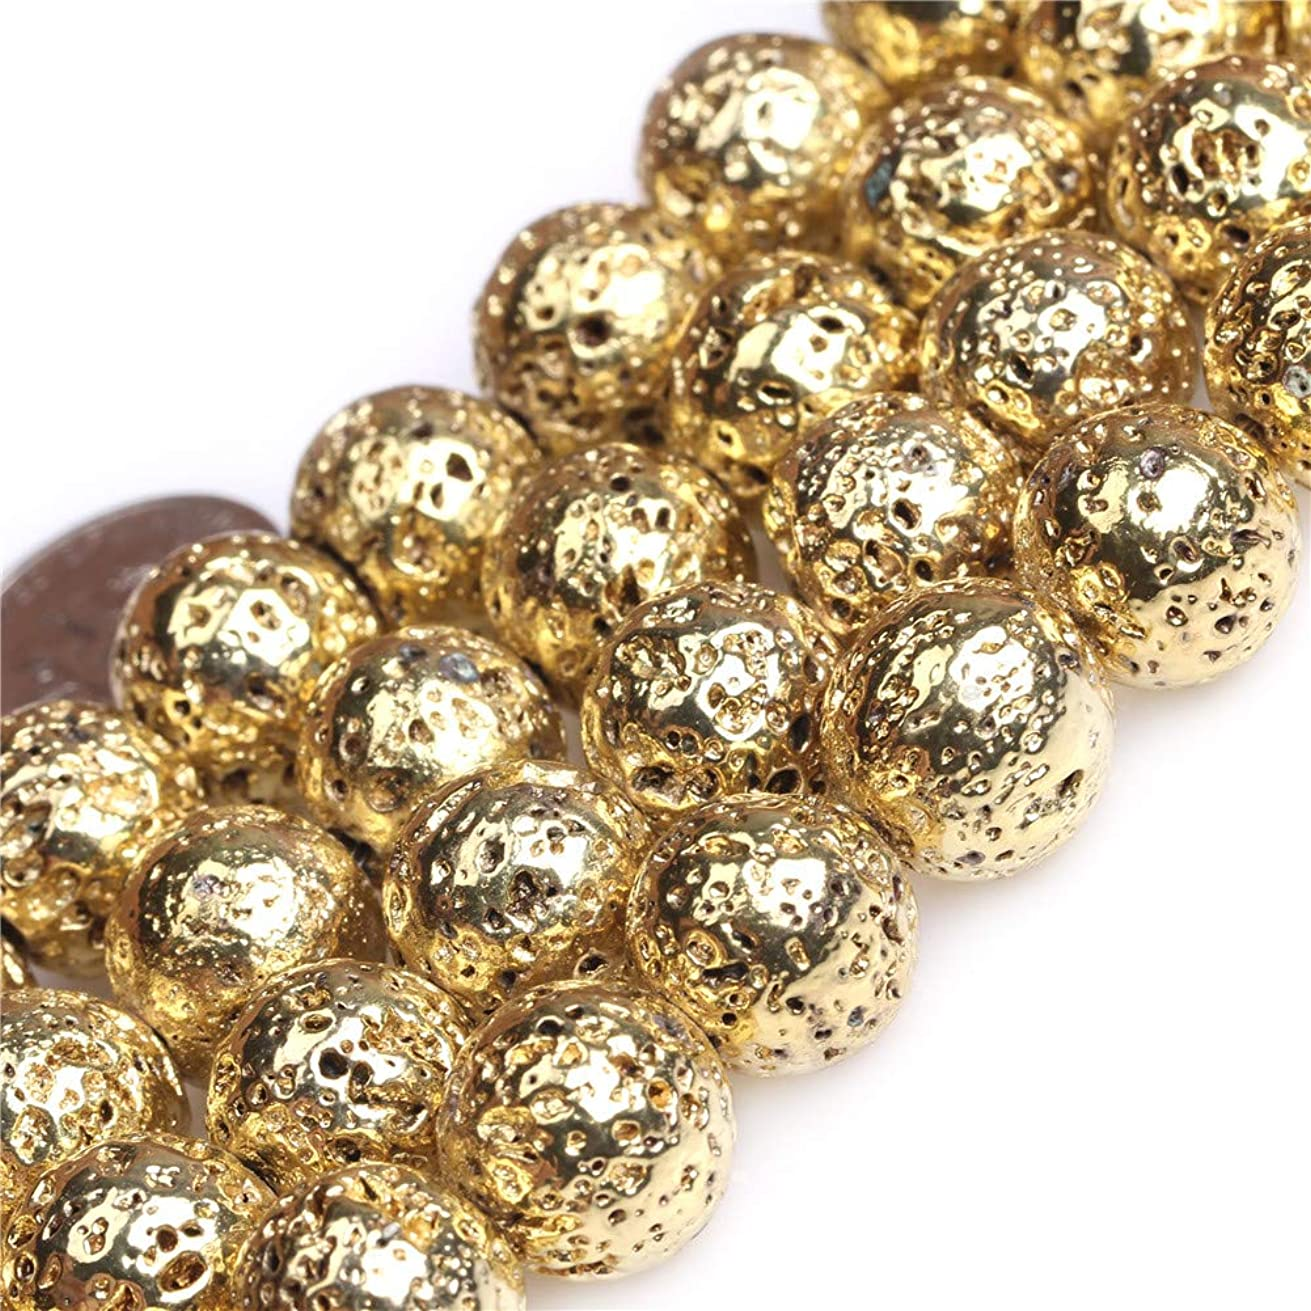 JOE FOREMAN Metallic Coated Round Volcanic Rock Stone Gemstone Beads for Jewelry Making Strand 15